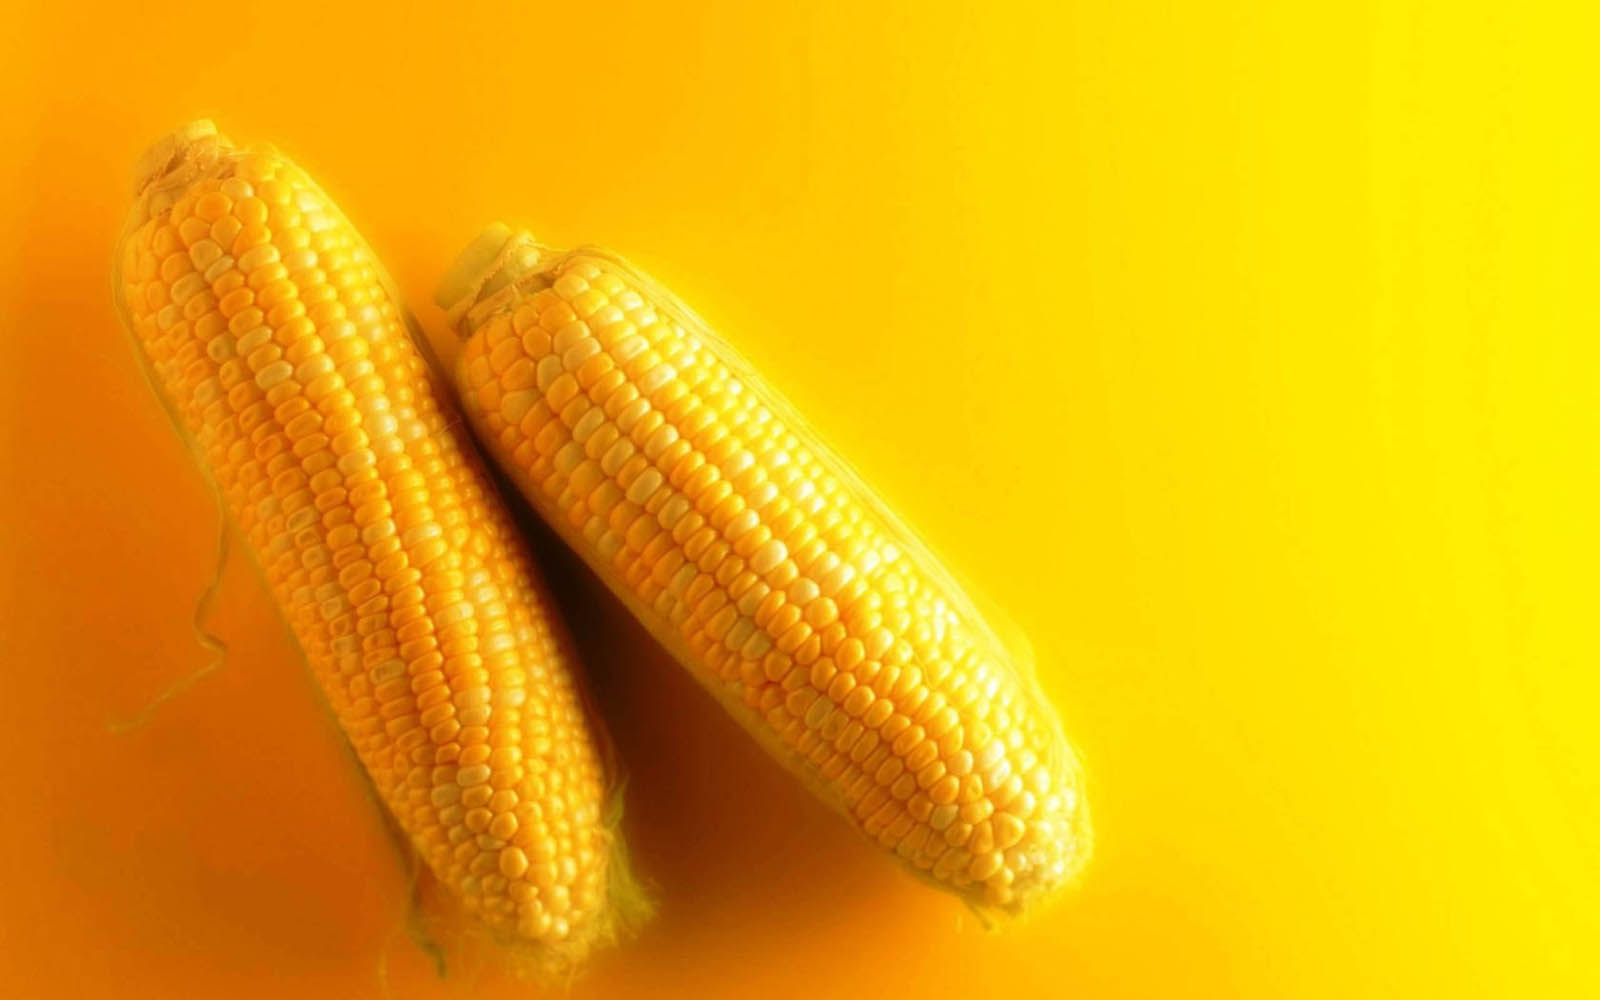 wallpapers: Fresh Corn